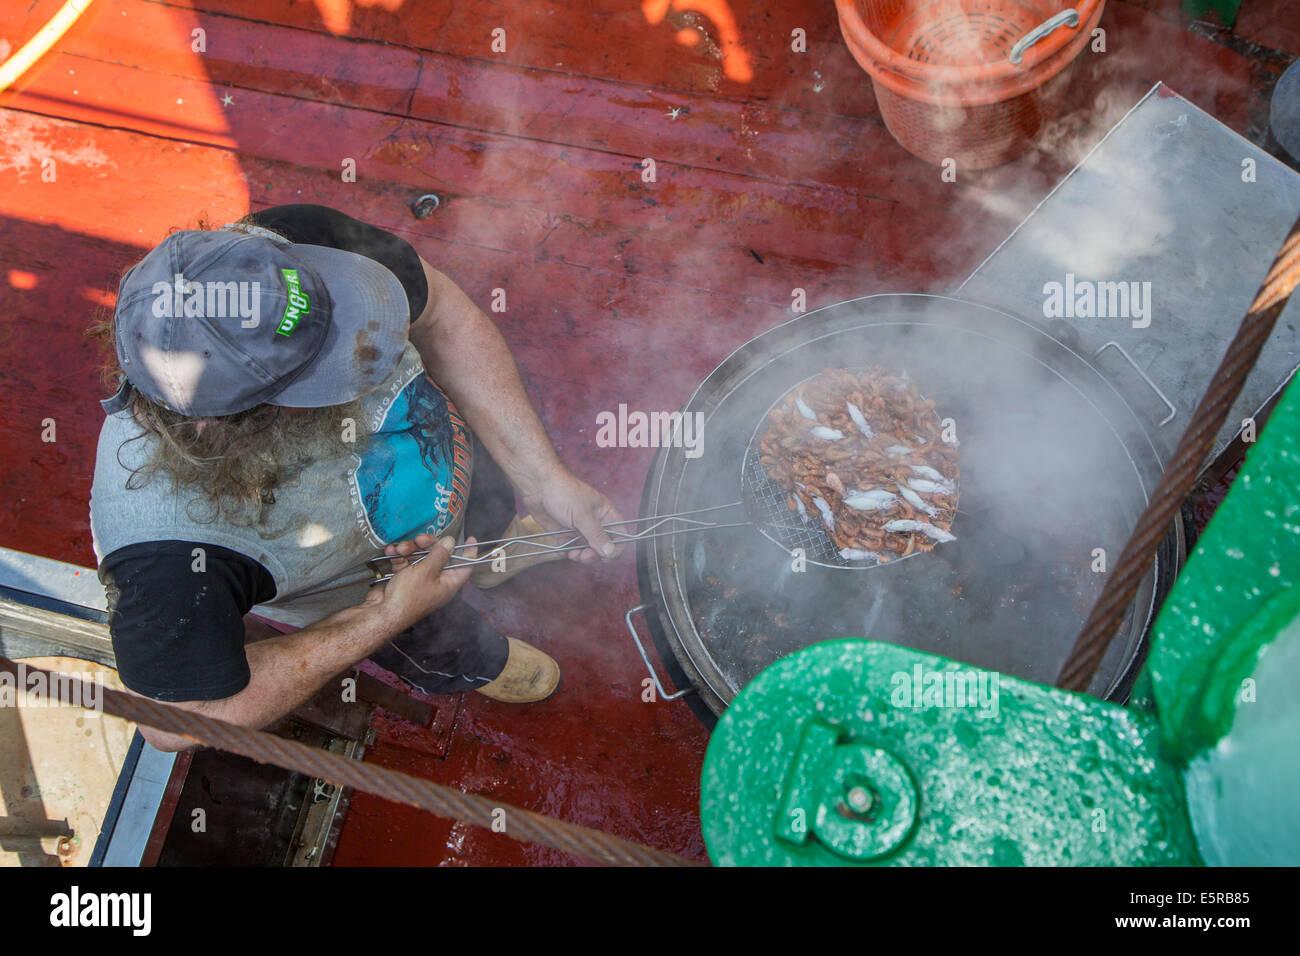 Fisherman boiling shrimps on board of shrimp boat fishing for shrimps on the North Sea - Stock Image